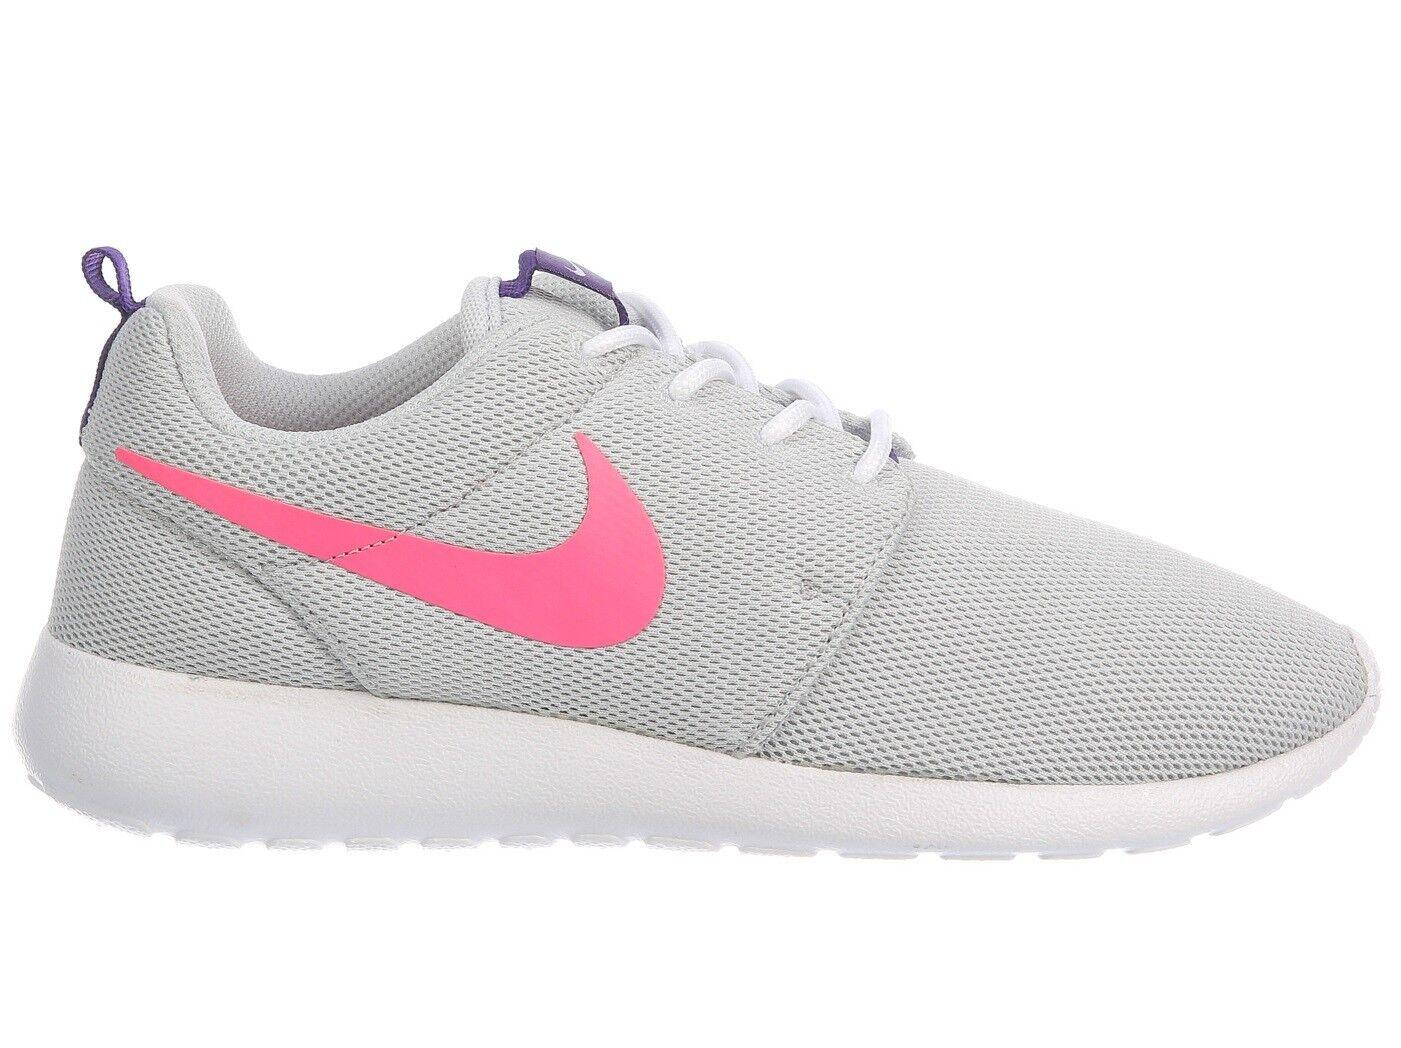 Nike Roshe One Womens 844994-007 Platinum Pink Purple Running Shoes Size 6.5